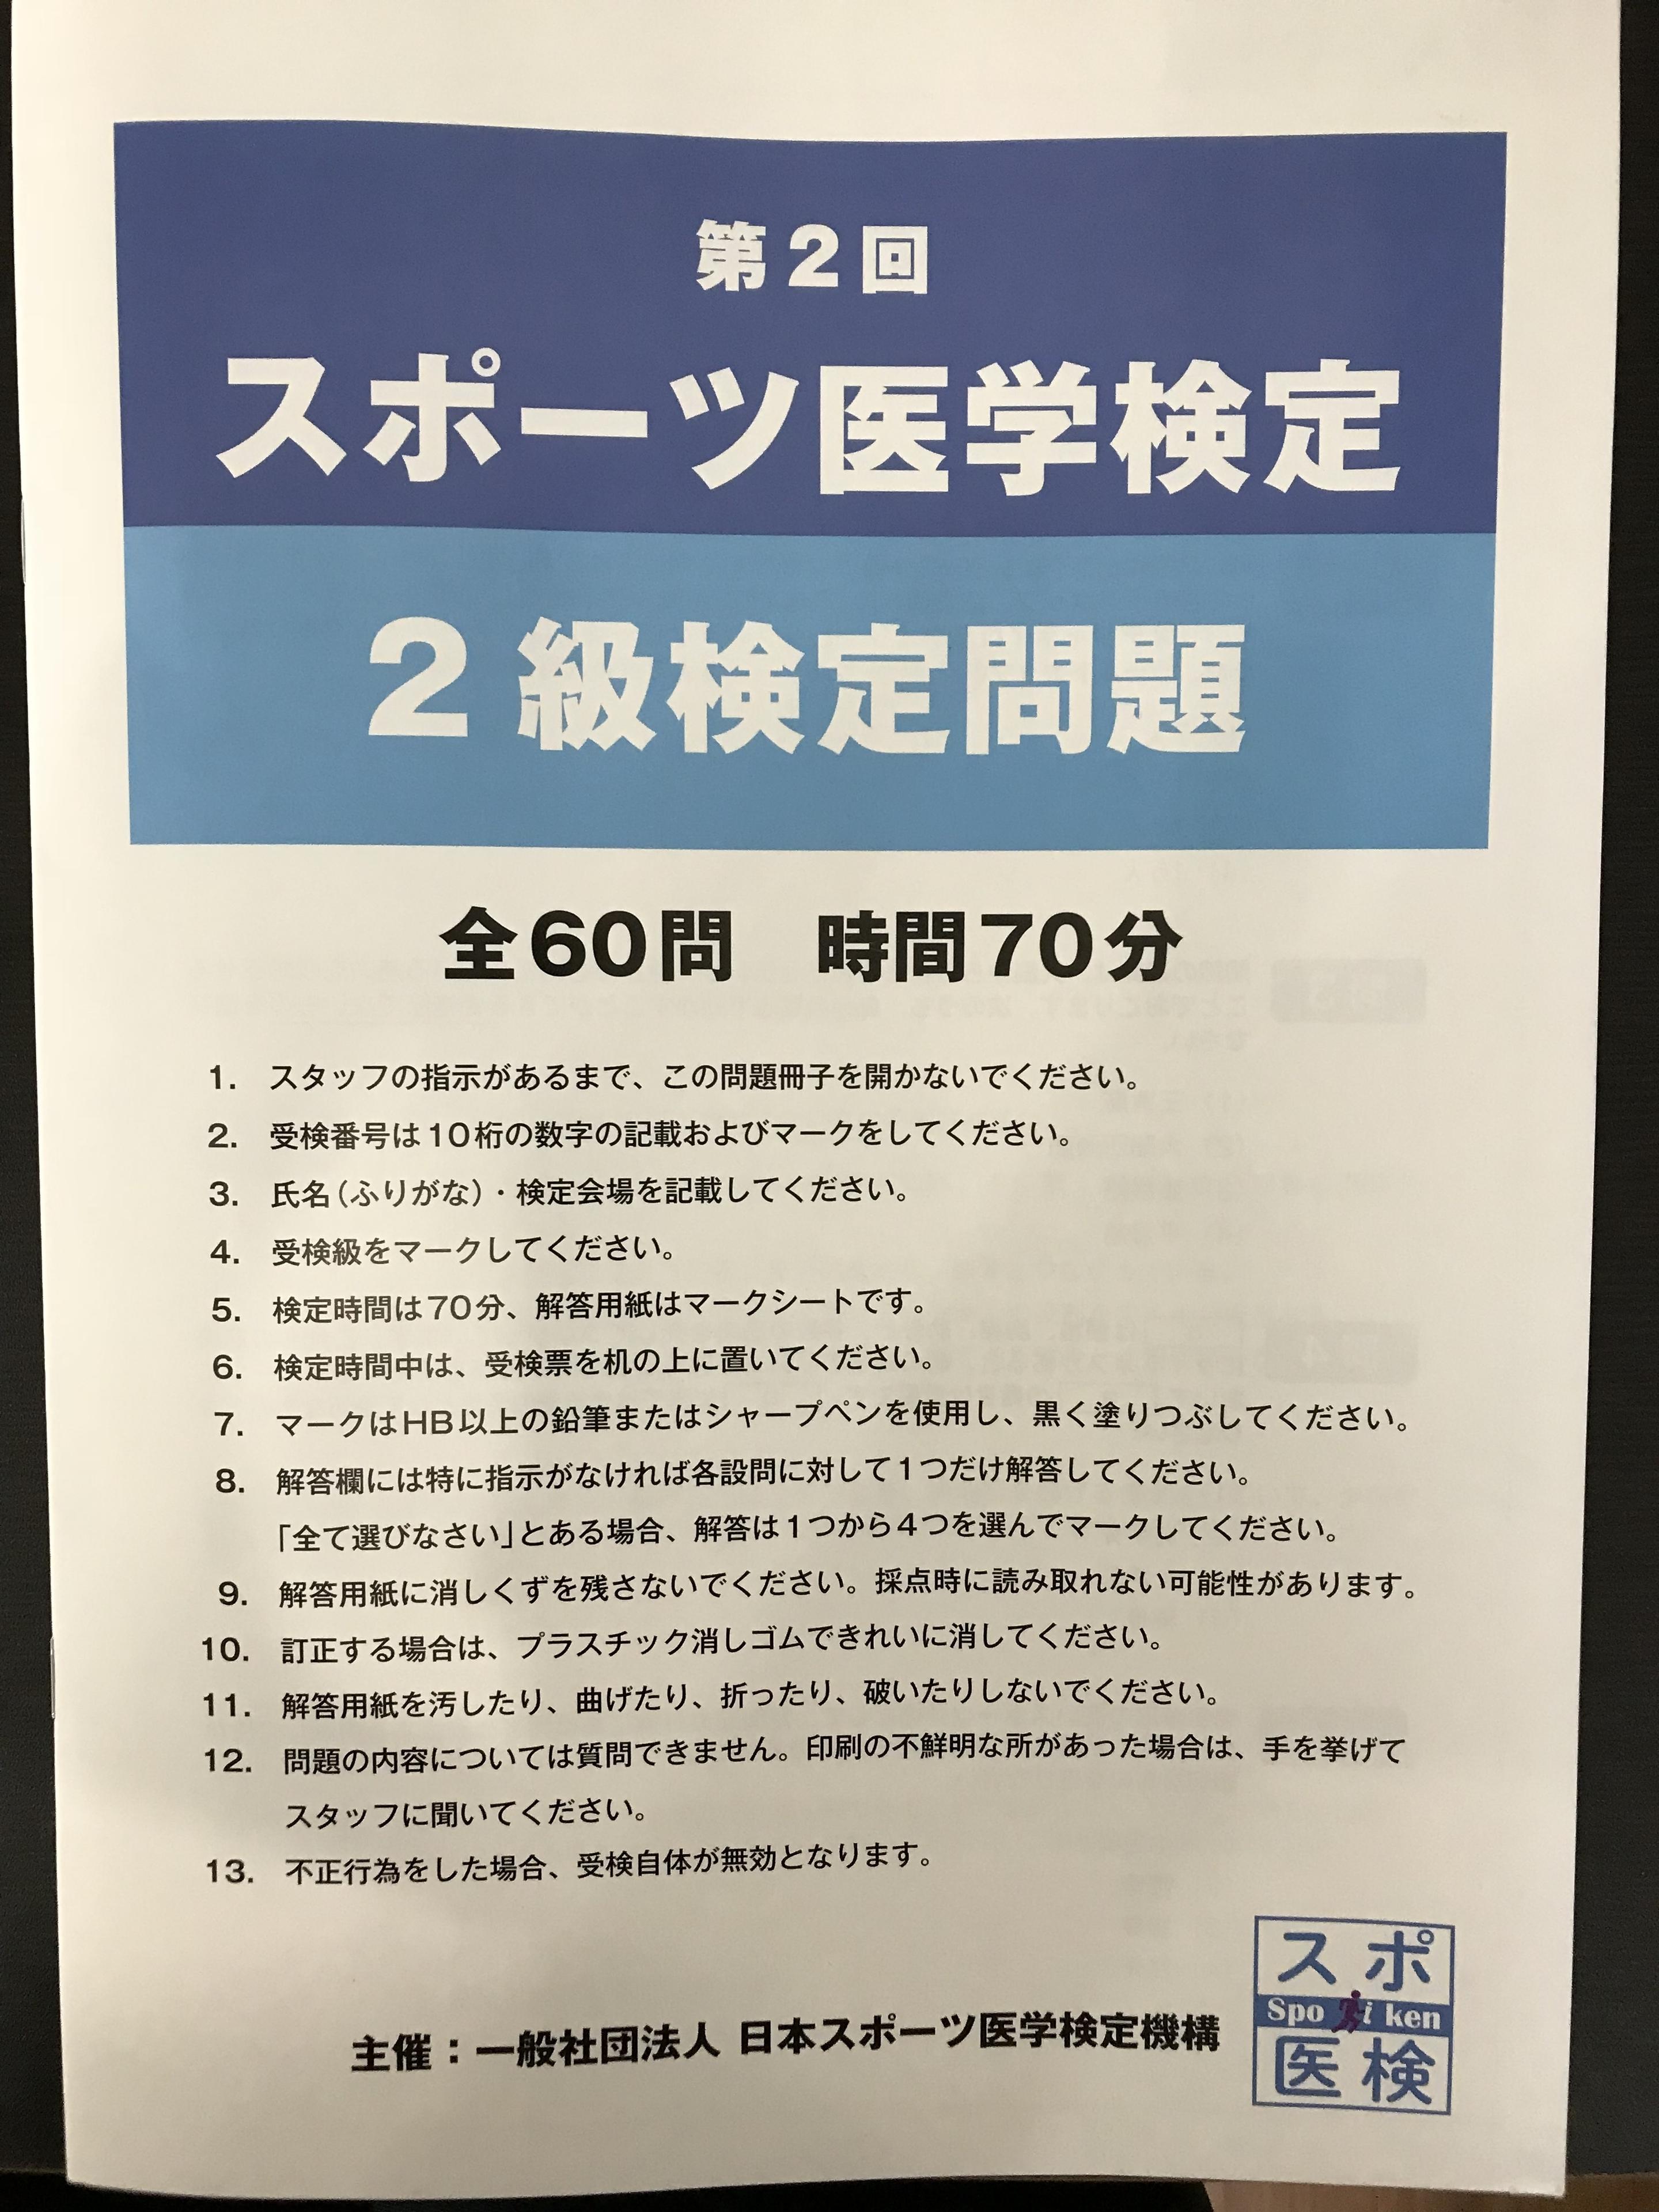 町 事故 白子 白子町(千葉県)の地域情報 Shirakomachi